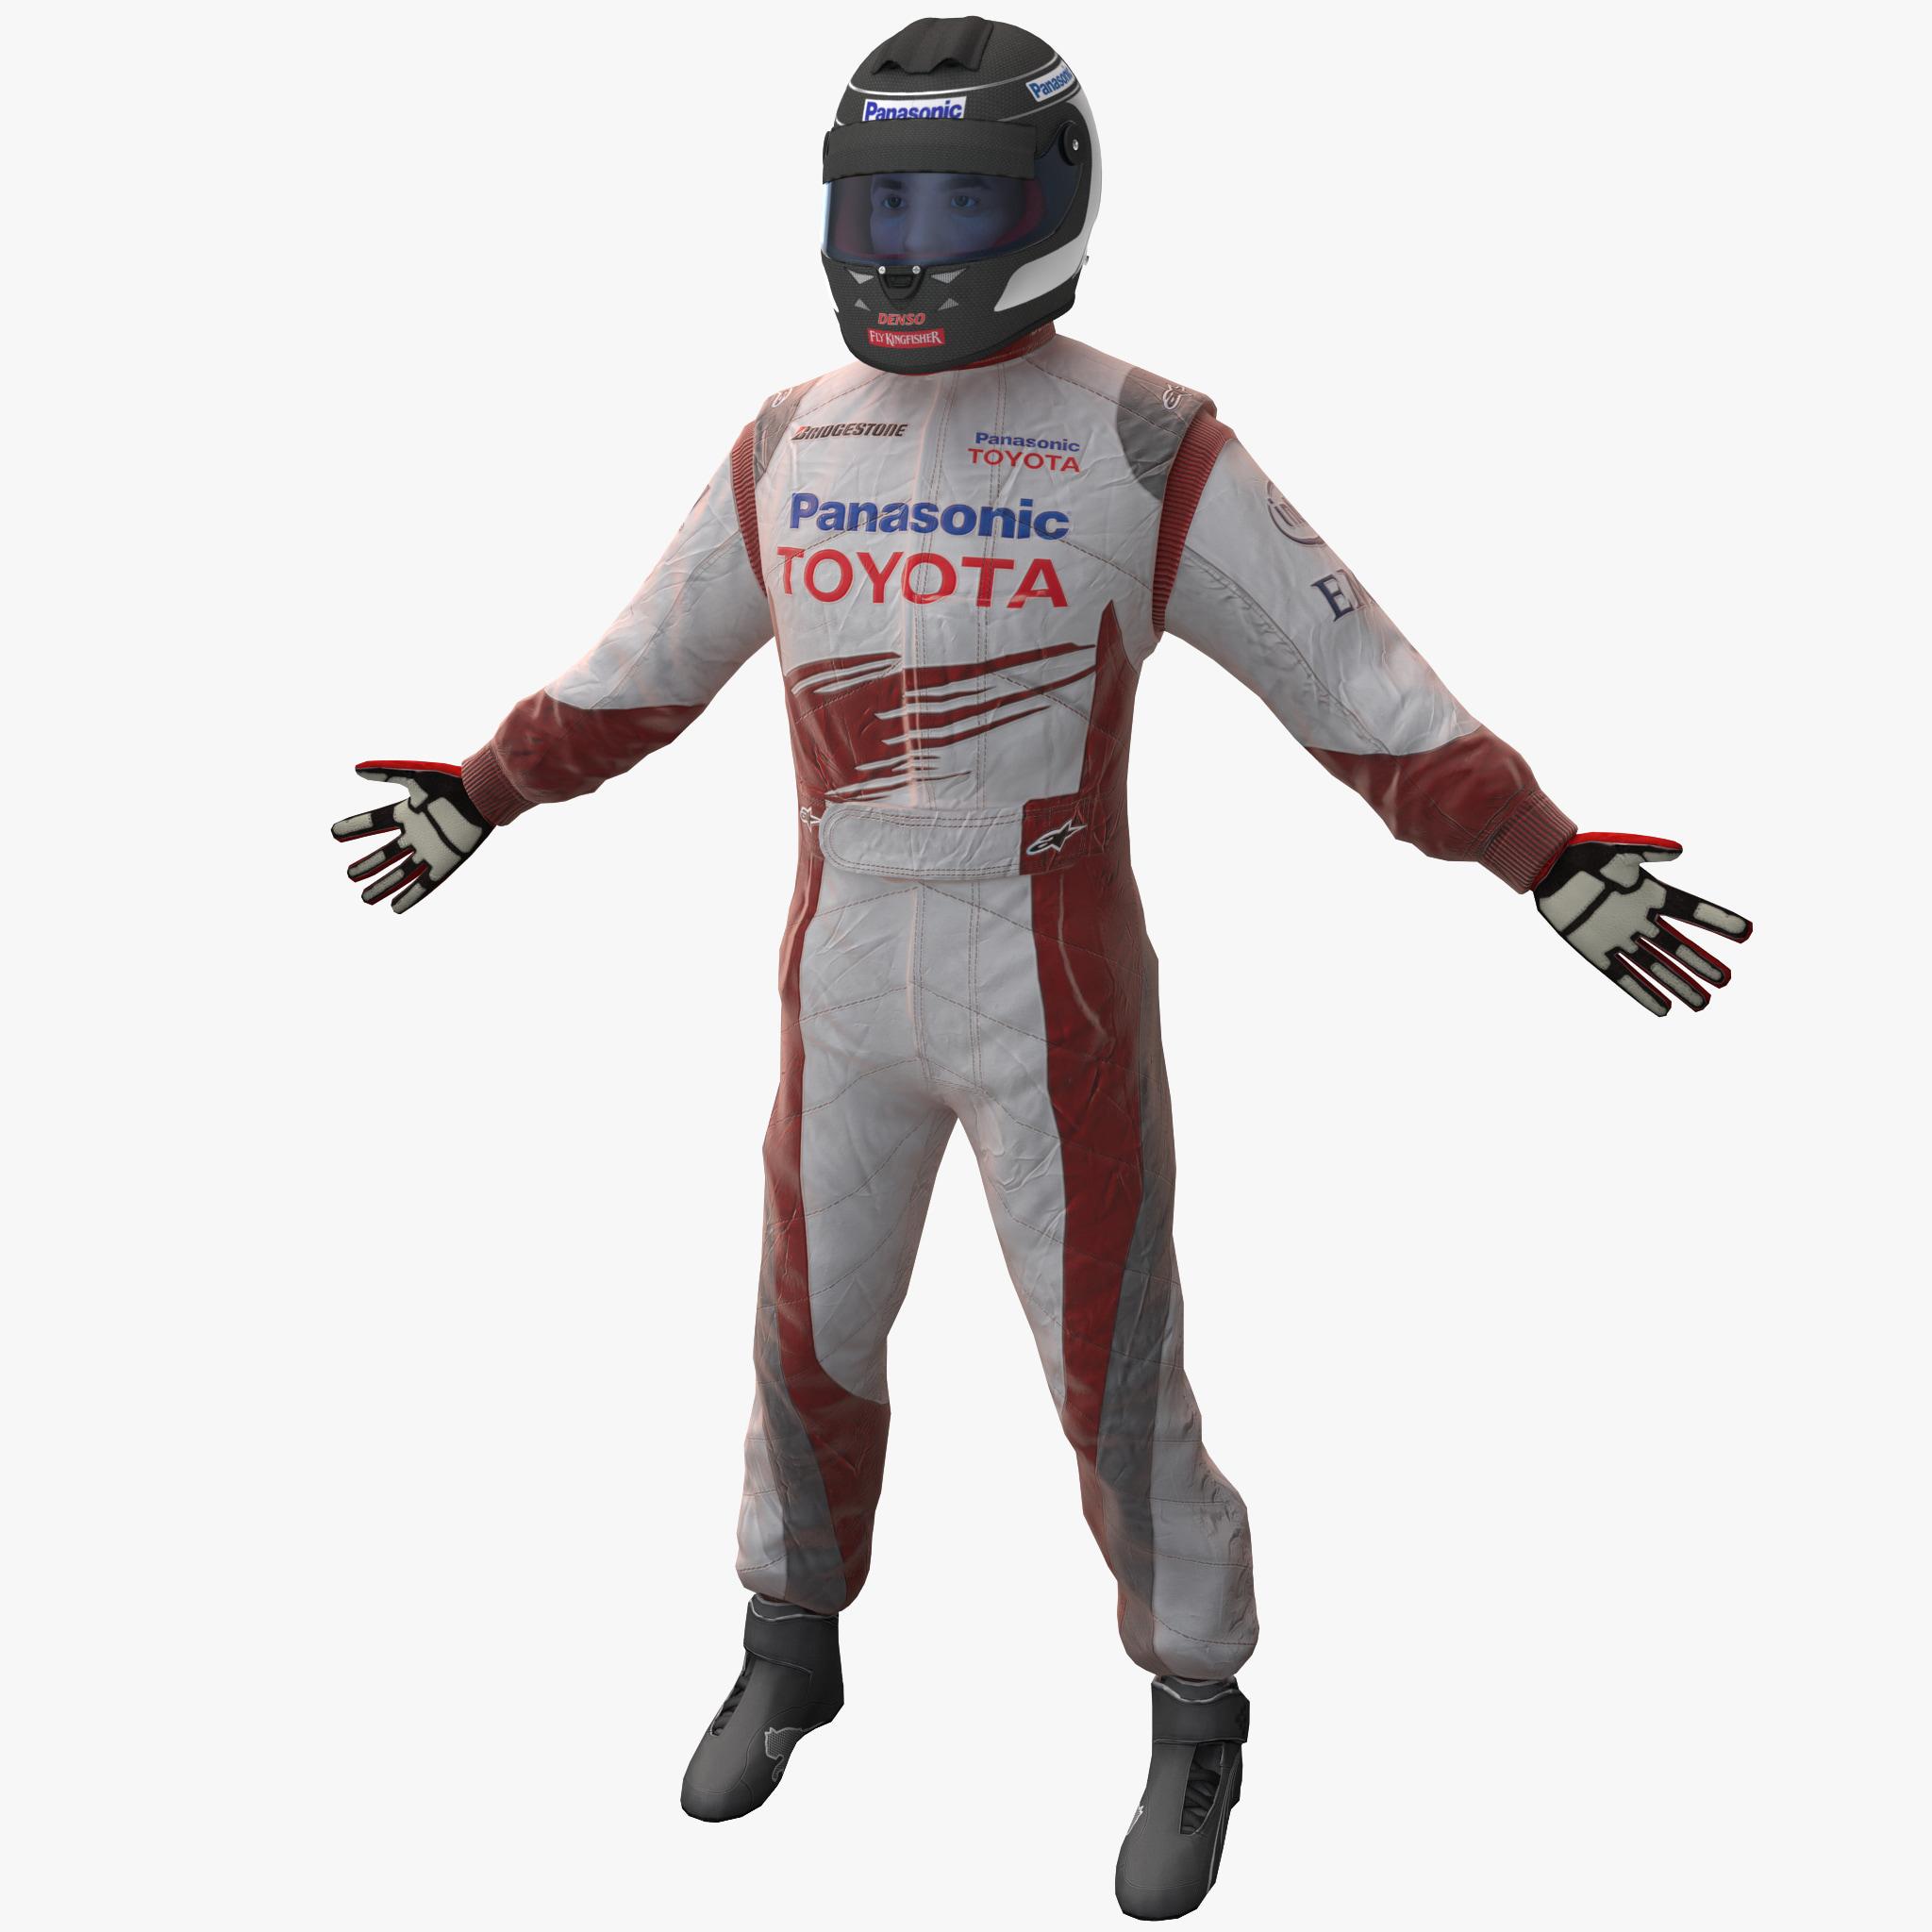 Racing Driver Toyota Rigged_1.jpg